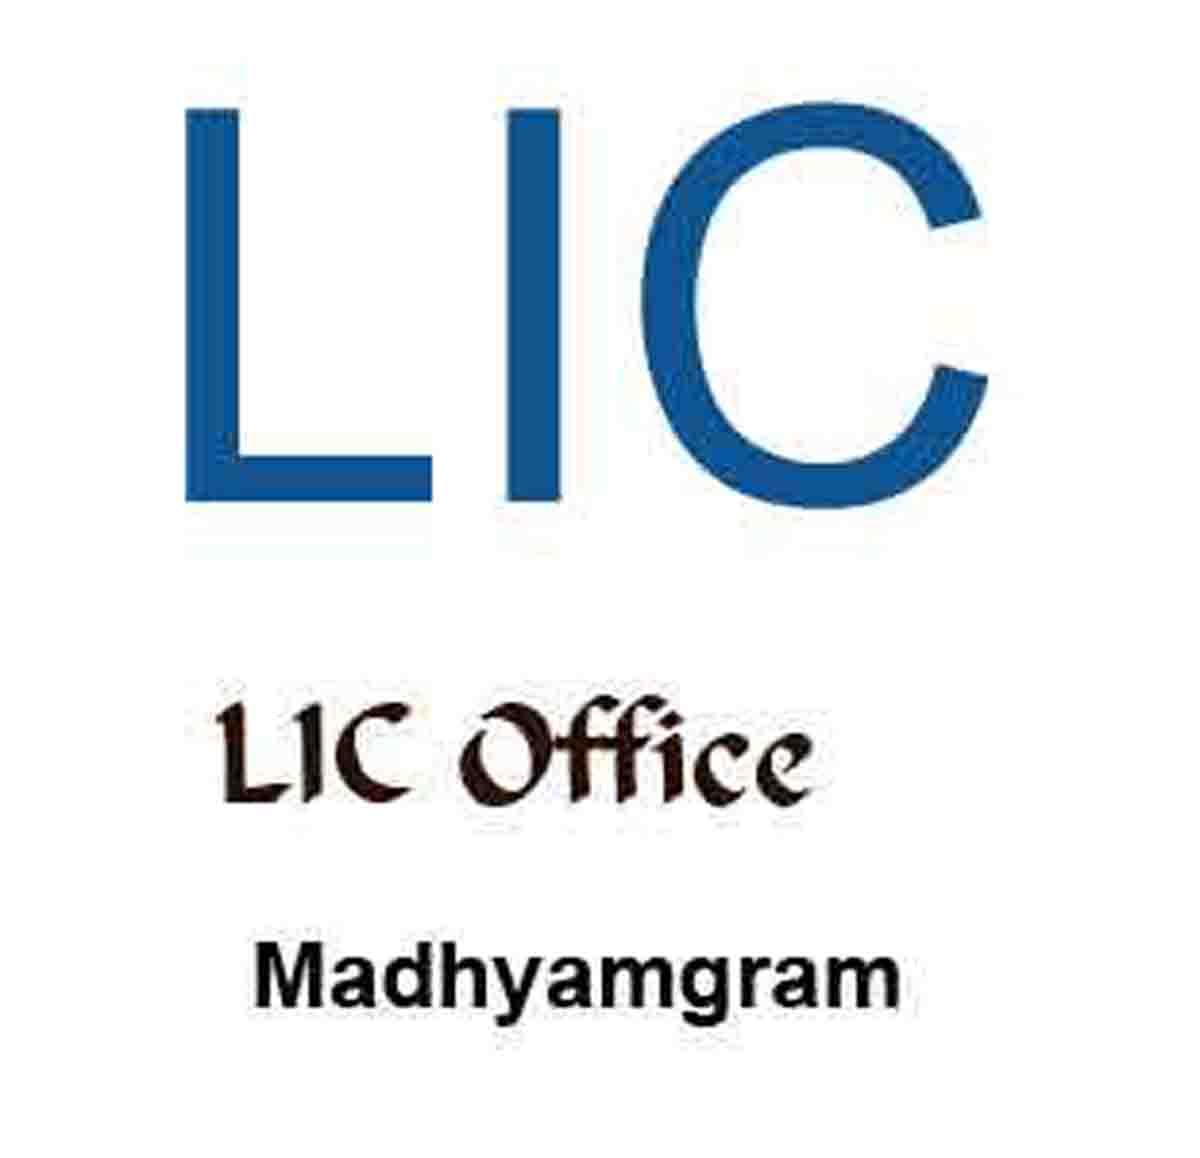 lic office madhyamgram